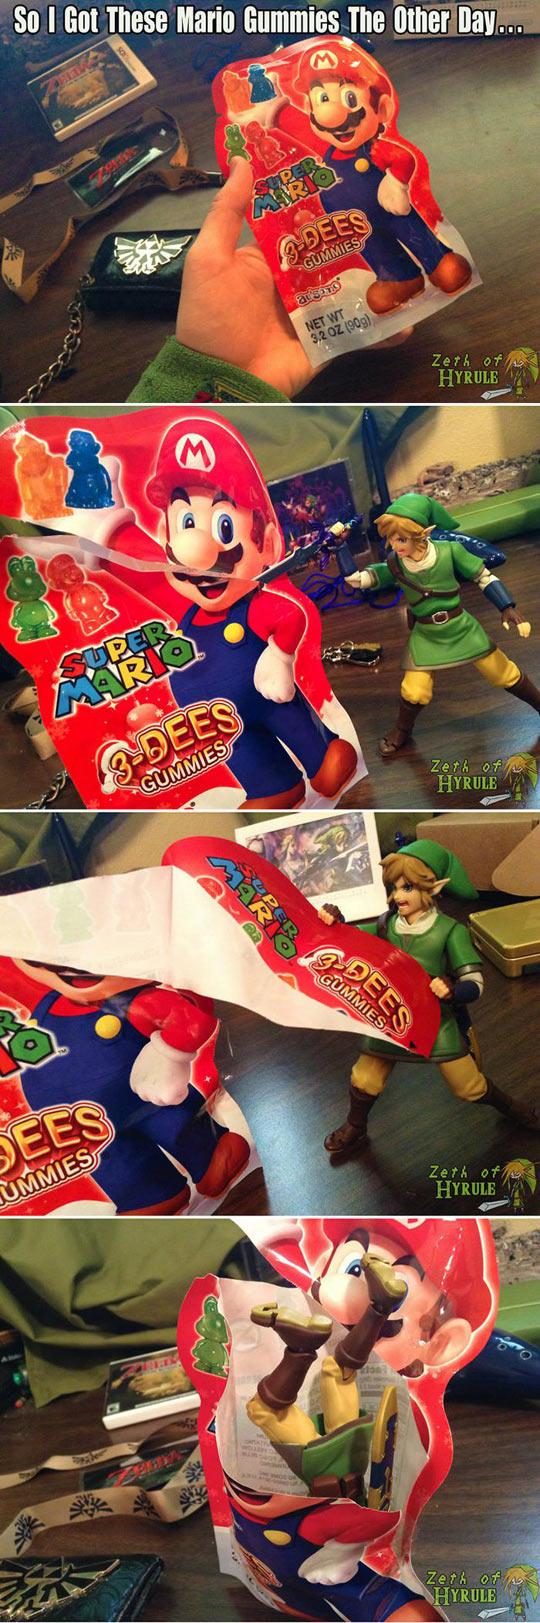 funny-Super-Mario-gummies-Link-eat